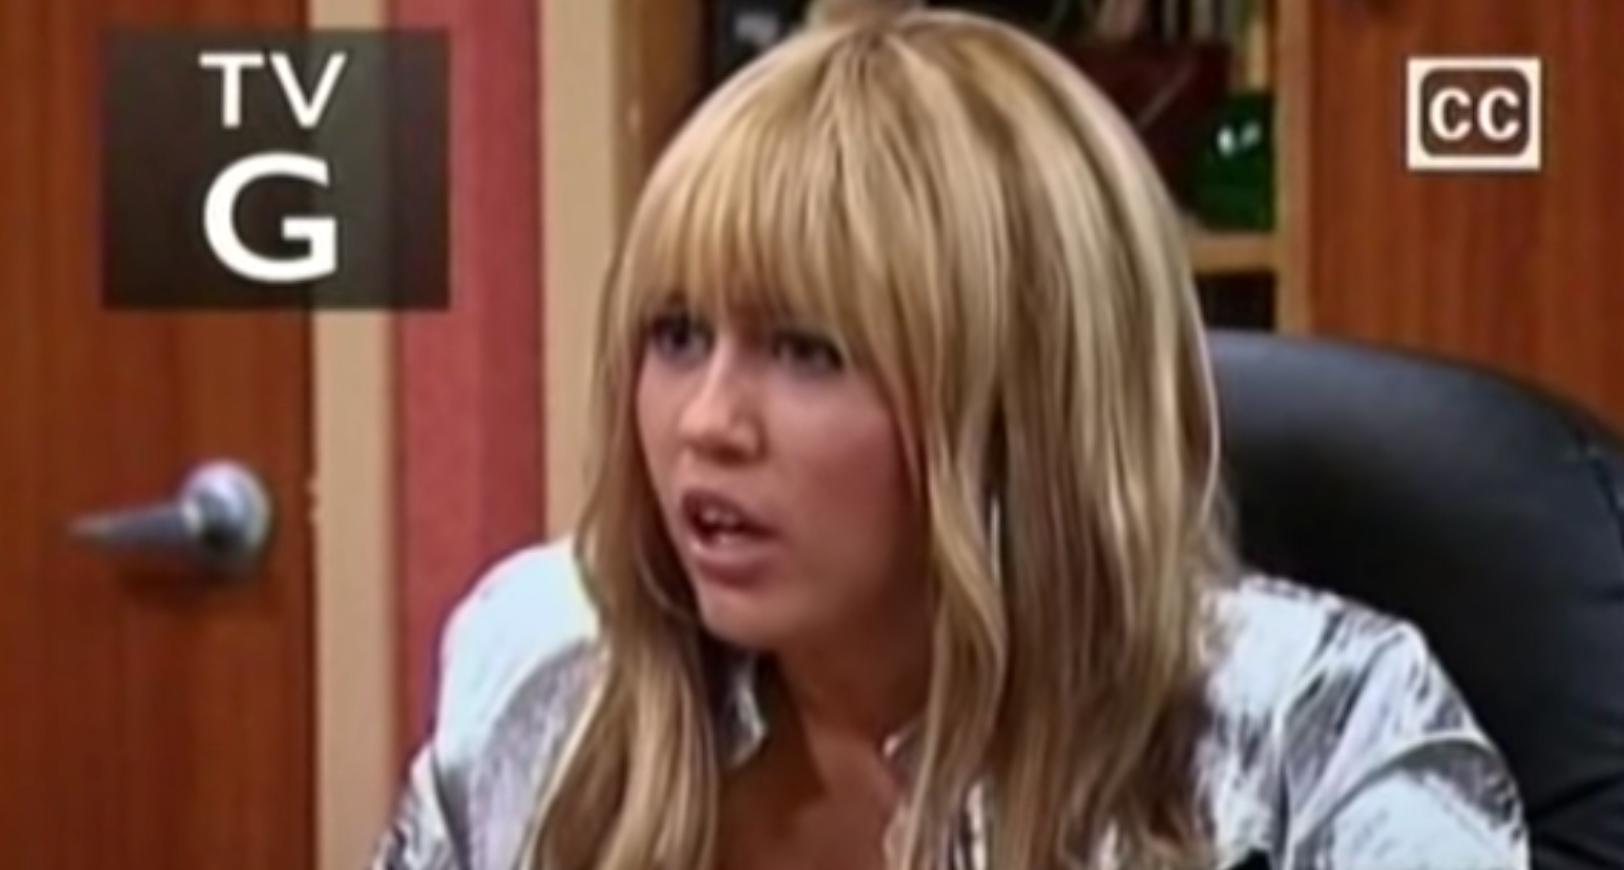 Why Hannah Montana ended